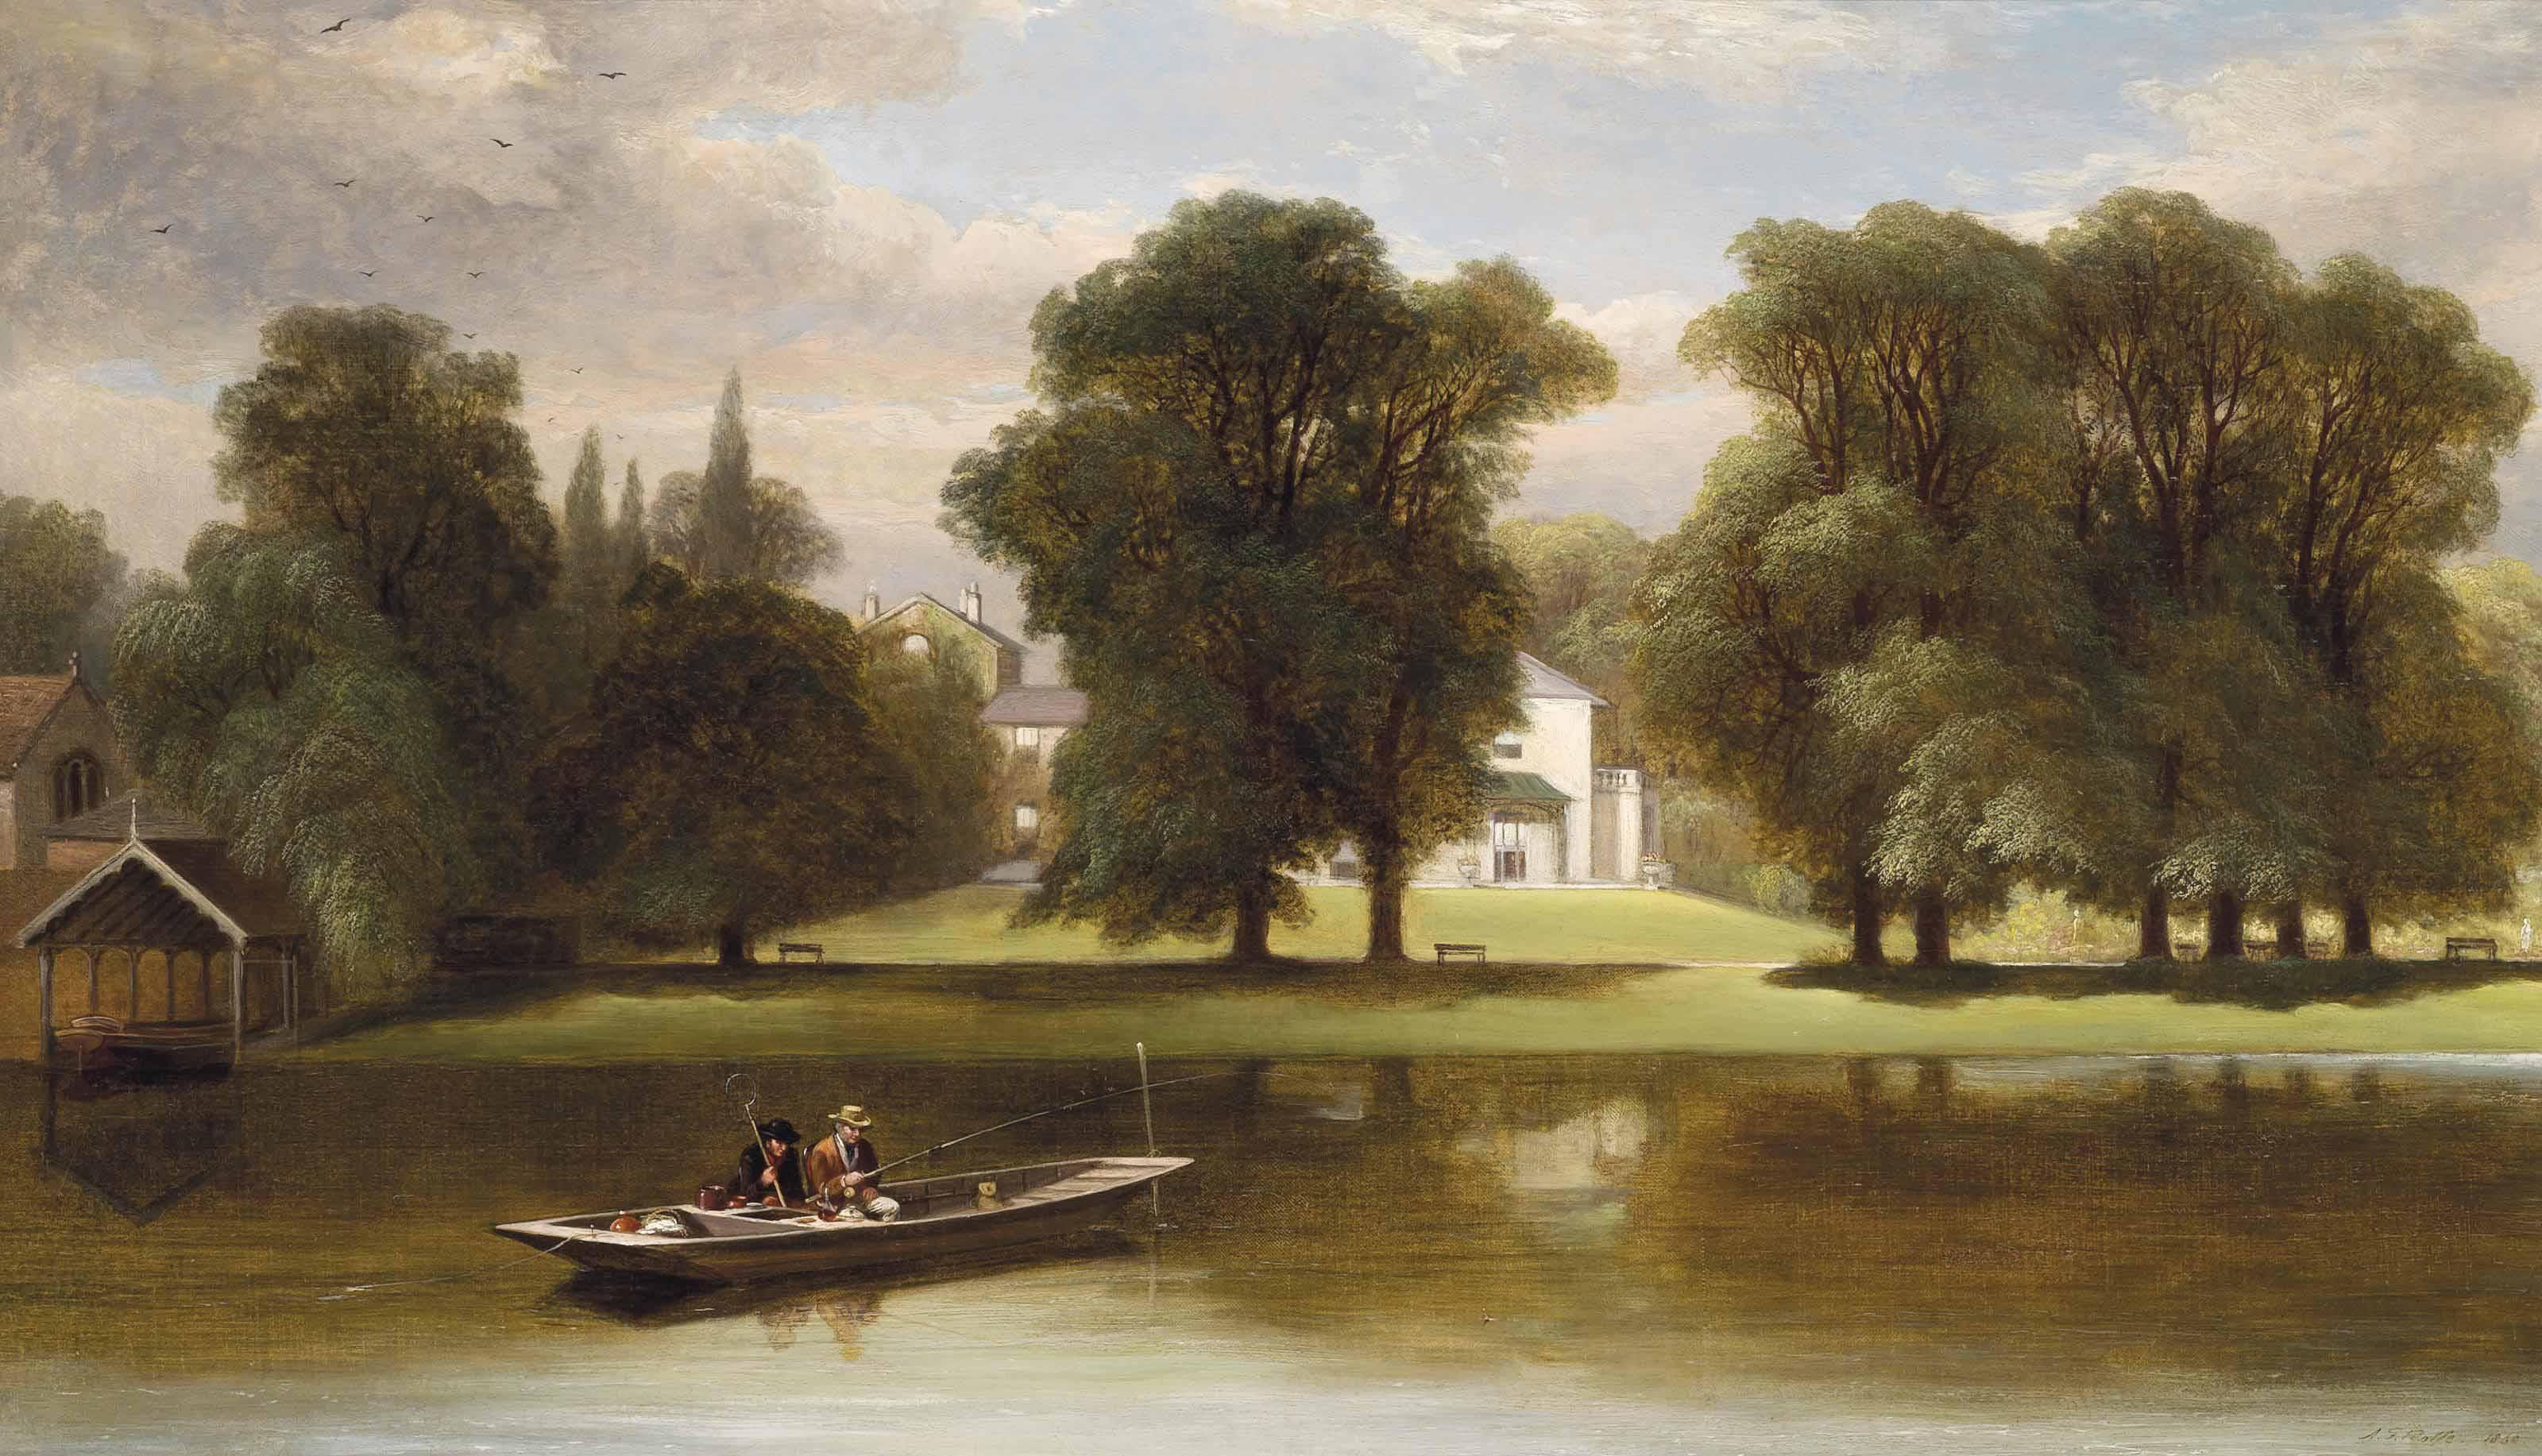 Fishing on the Thames at Twickenham